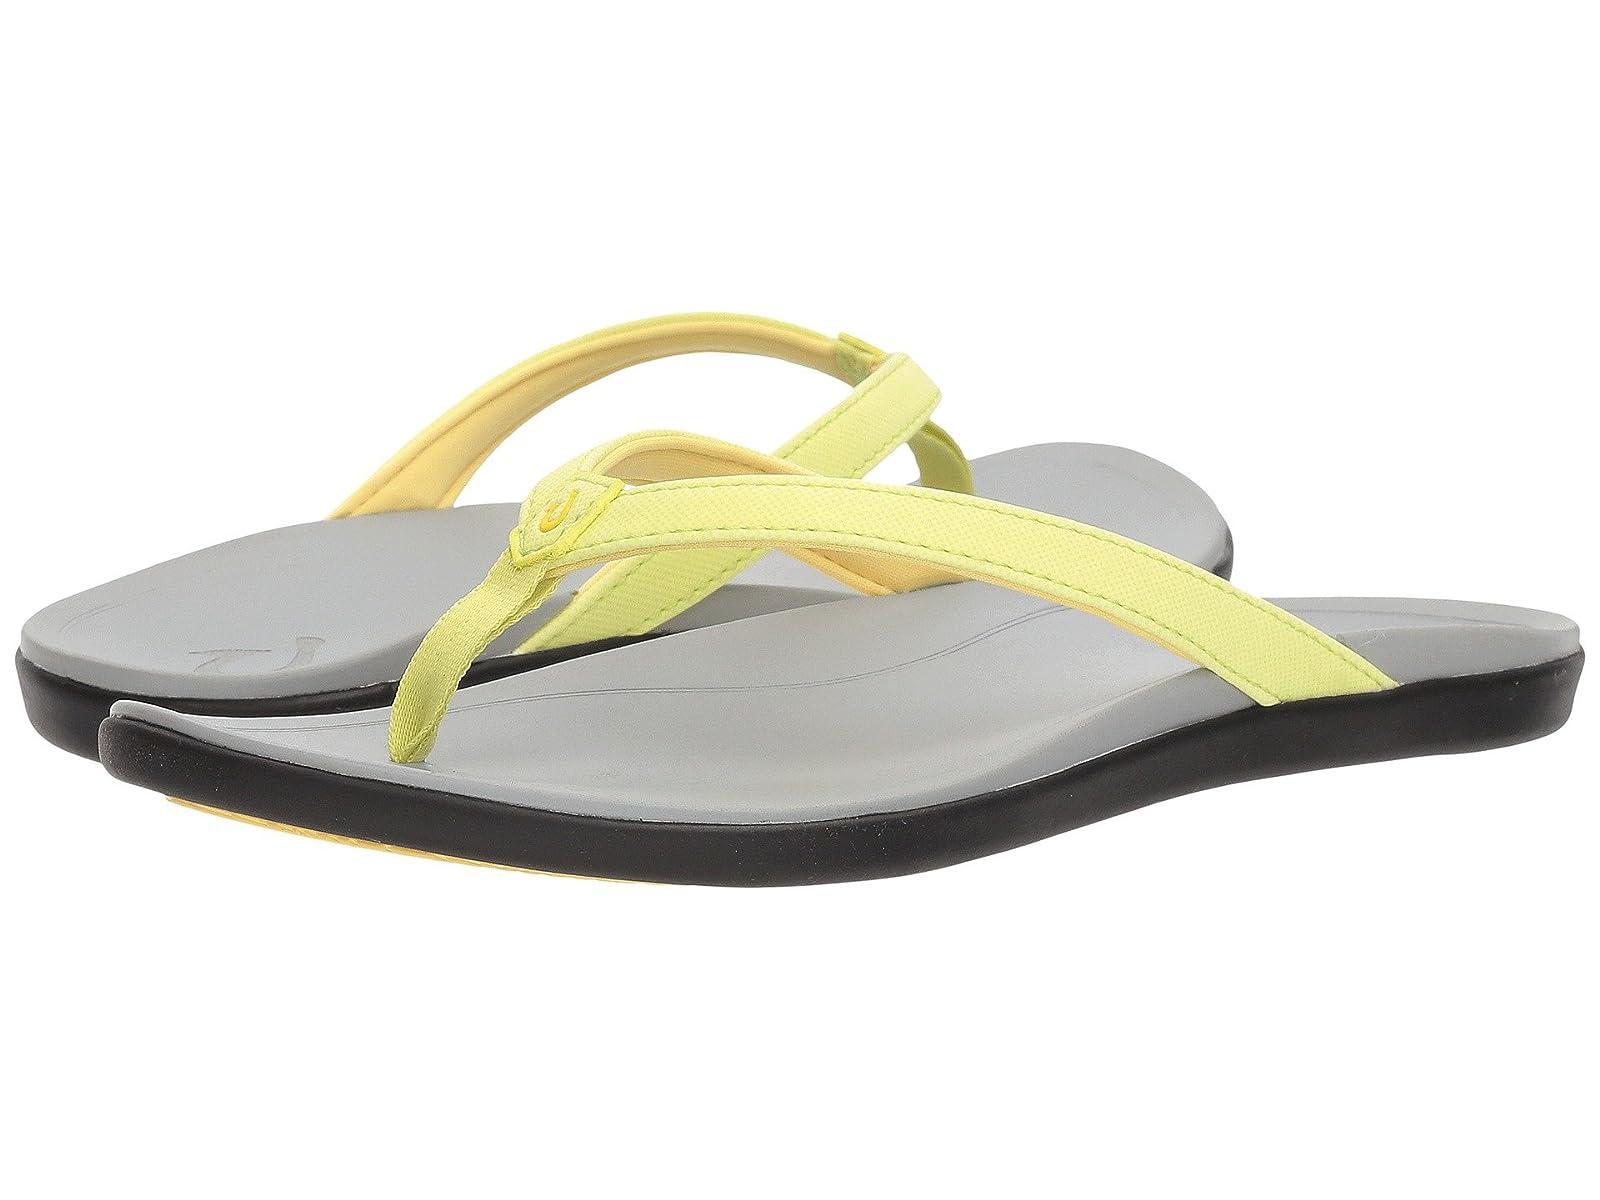 OluKai Ho'opioAtmospheric grades have affordable shoes